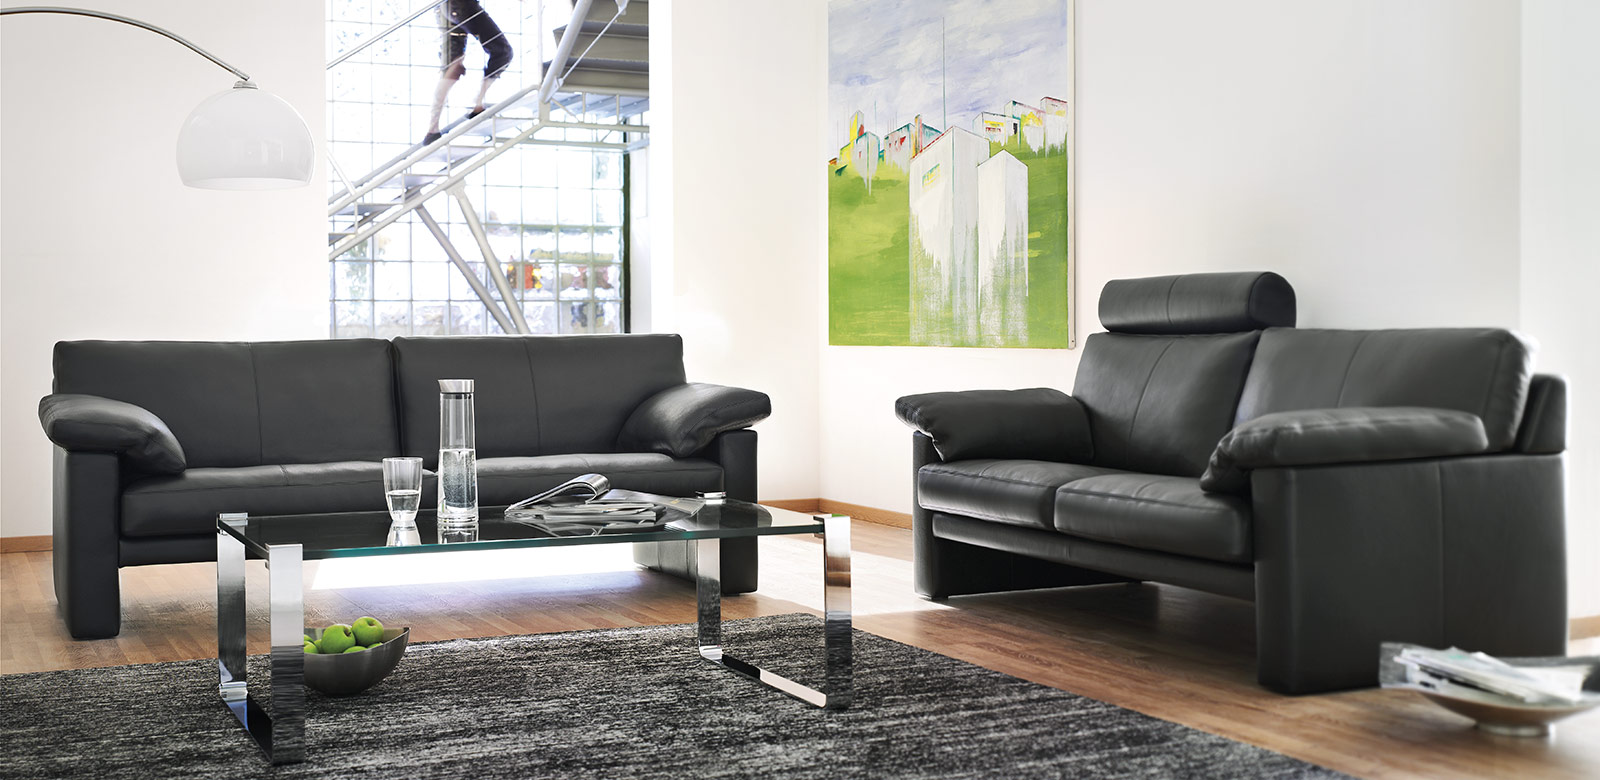 Full Size of Erpo Luxussofa Cl 300 Luxusmbel Designermbel Grünes Sofa Schlafsofa Liegefläche 180x200 Mit Schlaffunktion 2 Sitzer Benz 3 Grau Leder Spannbezug U Form Xxl Sofa Erpo Sofa